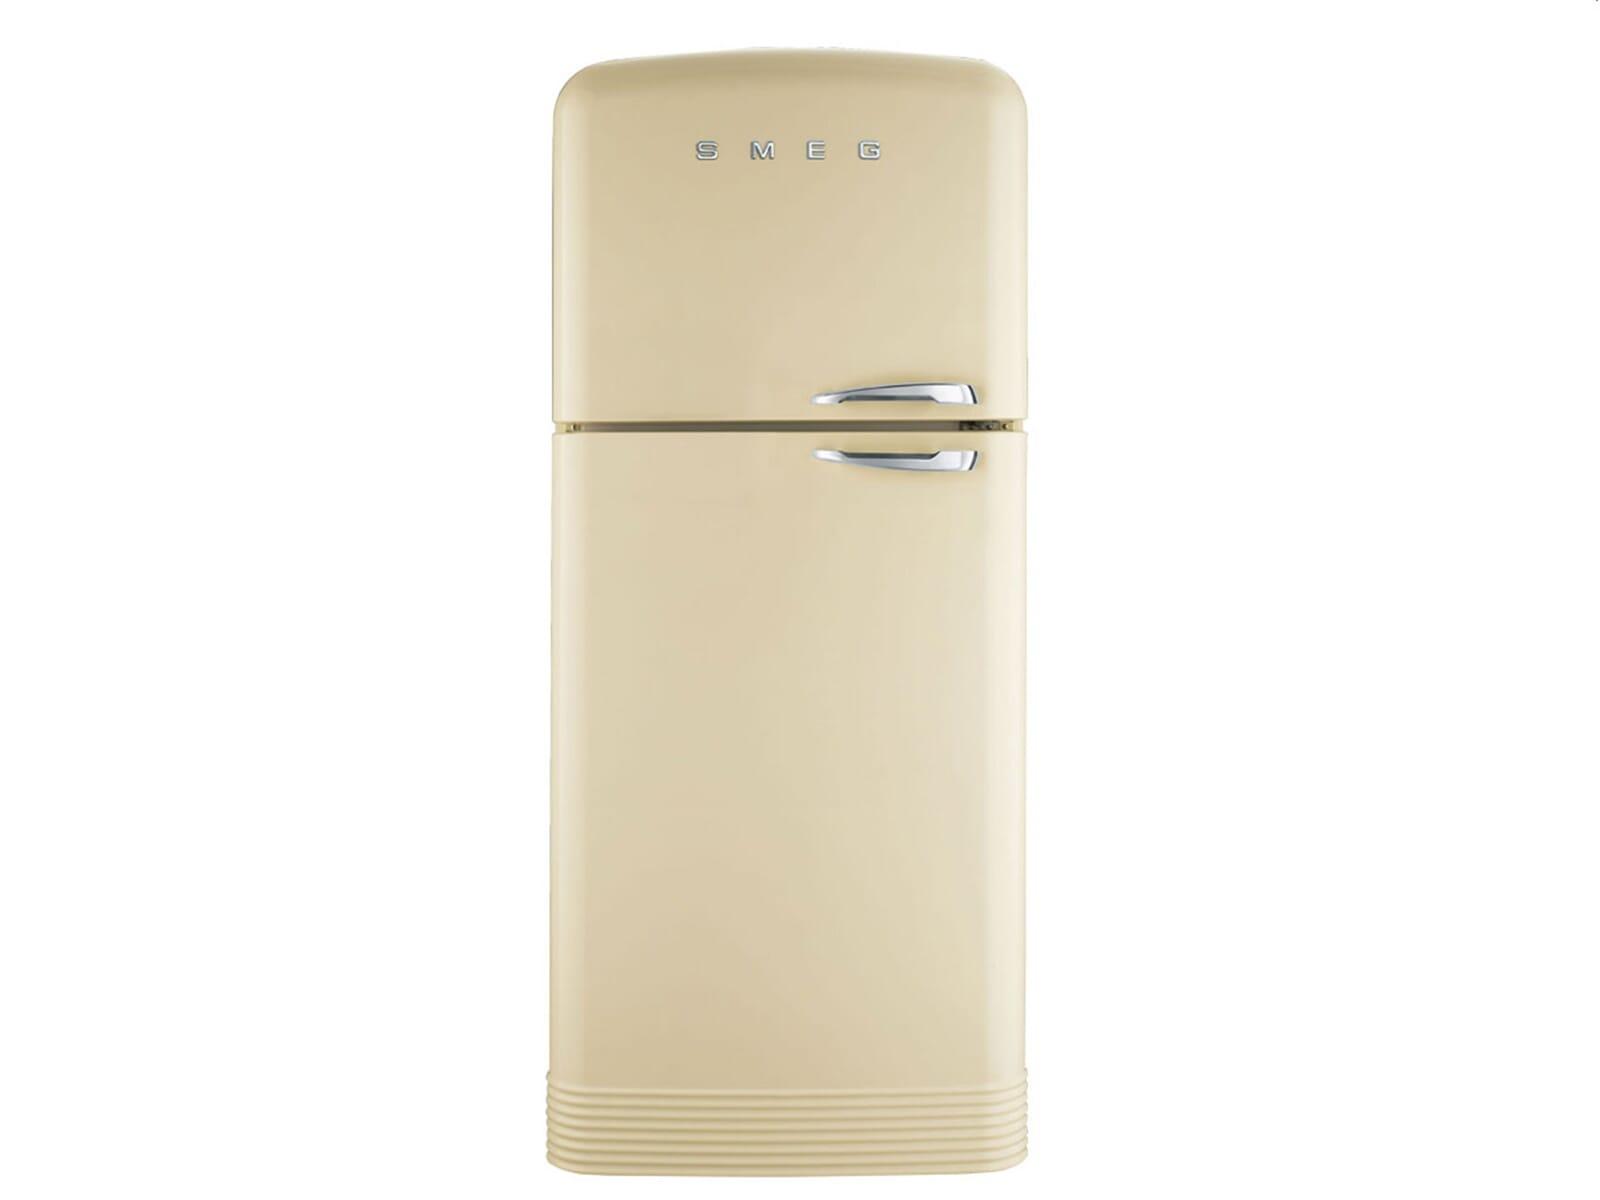 Kühlschrank Kombi : Kühlschrank kombi günstig gefrierschrank kombination haus dekoration